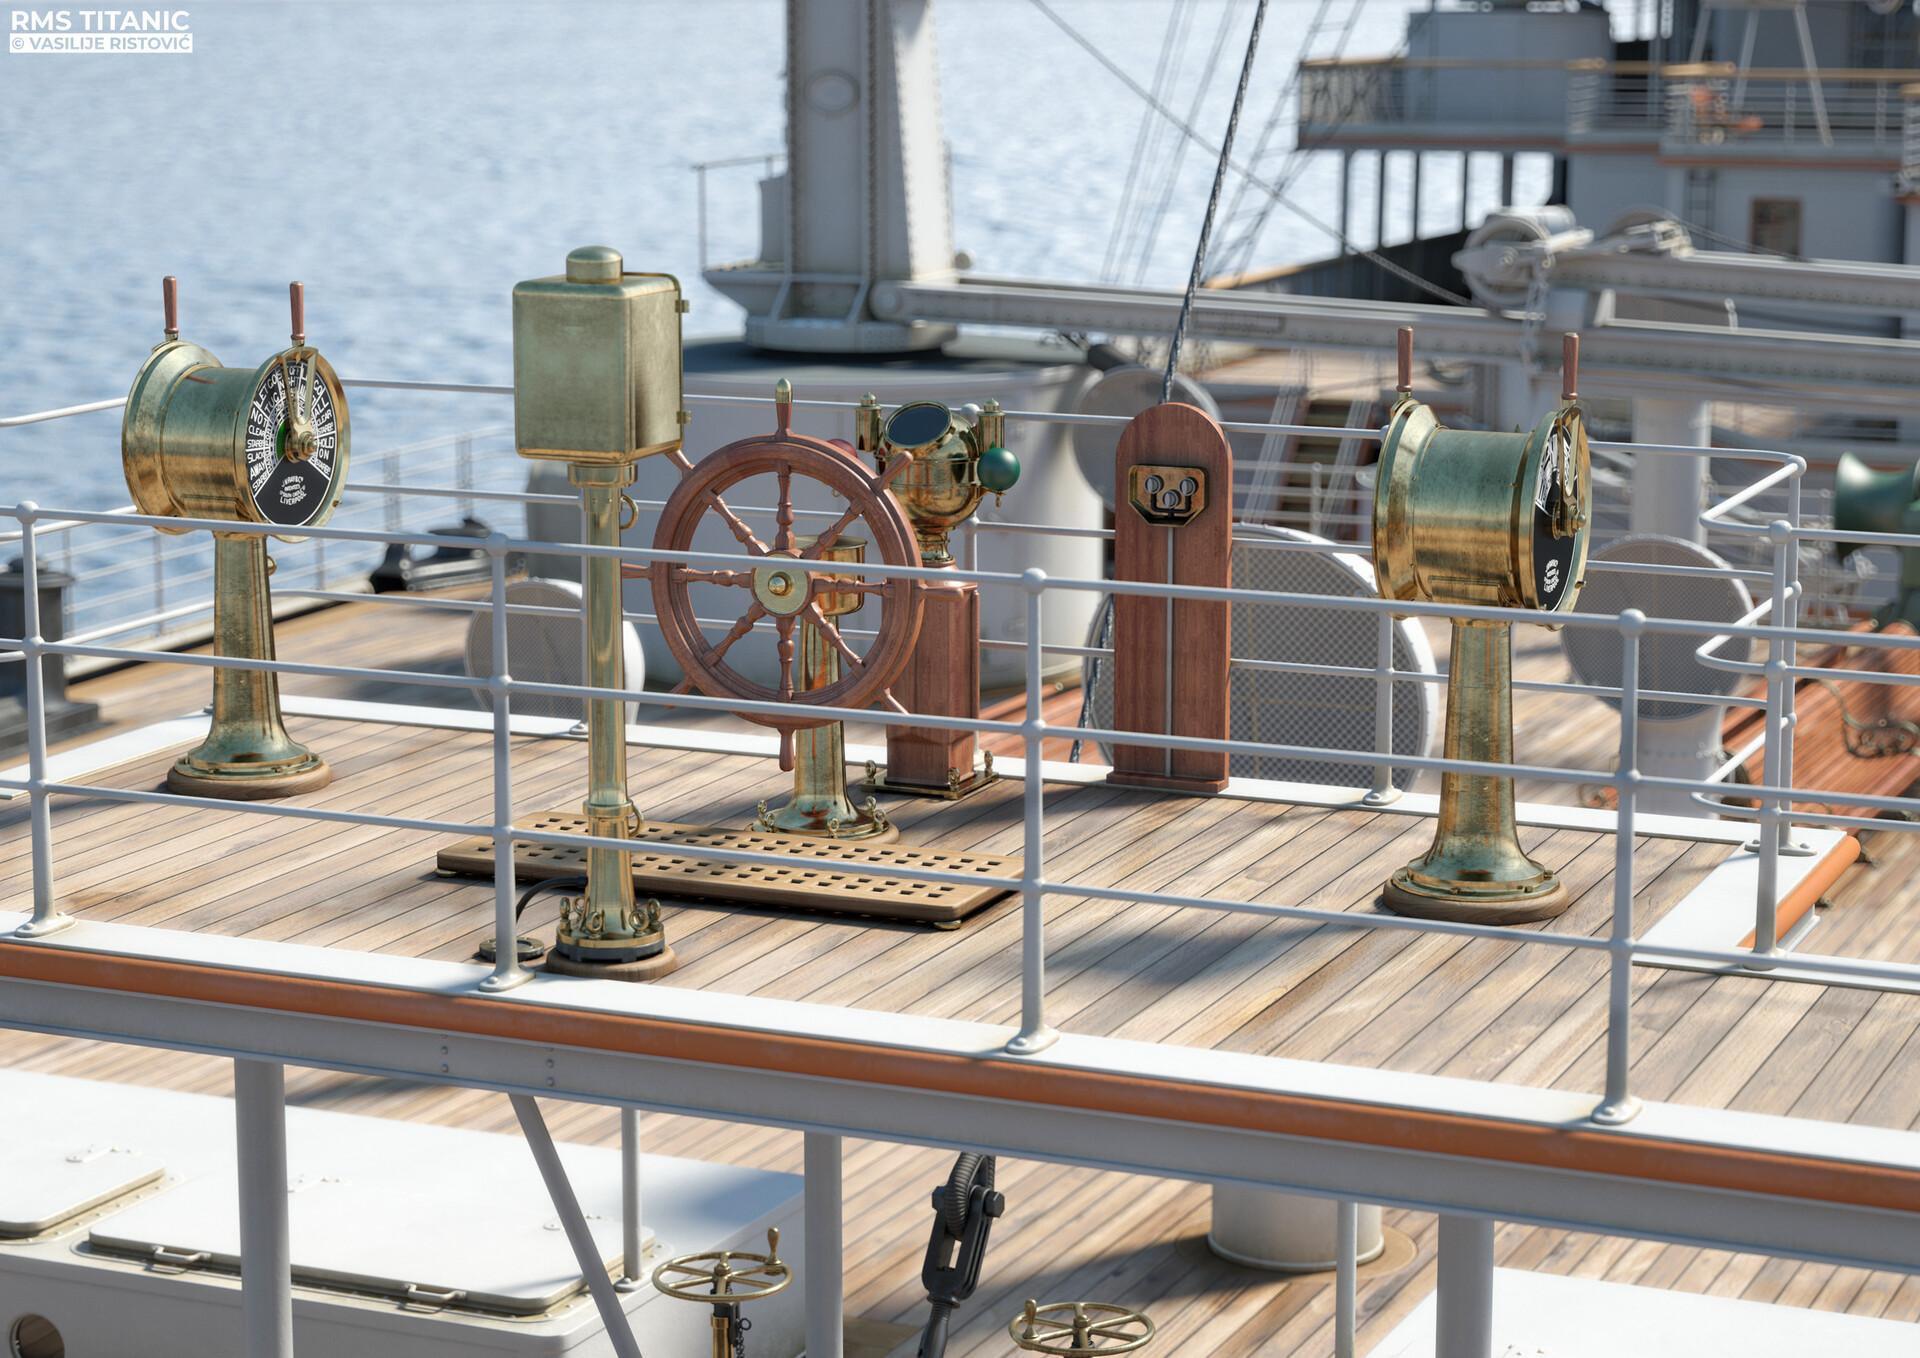 Montage Titanic Trumpeter 1/200 - Page 10 Vasilije-ristovic-02b